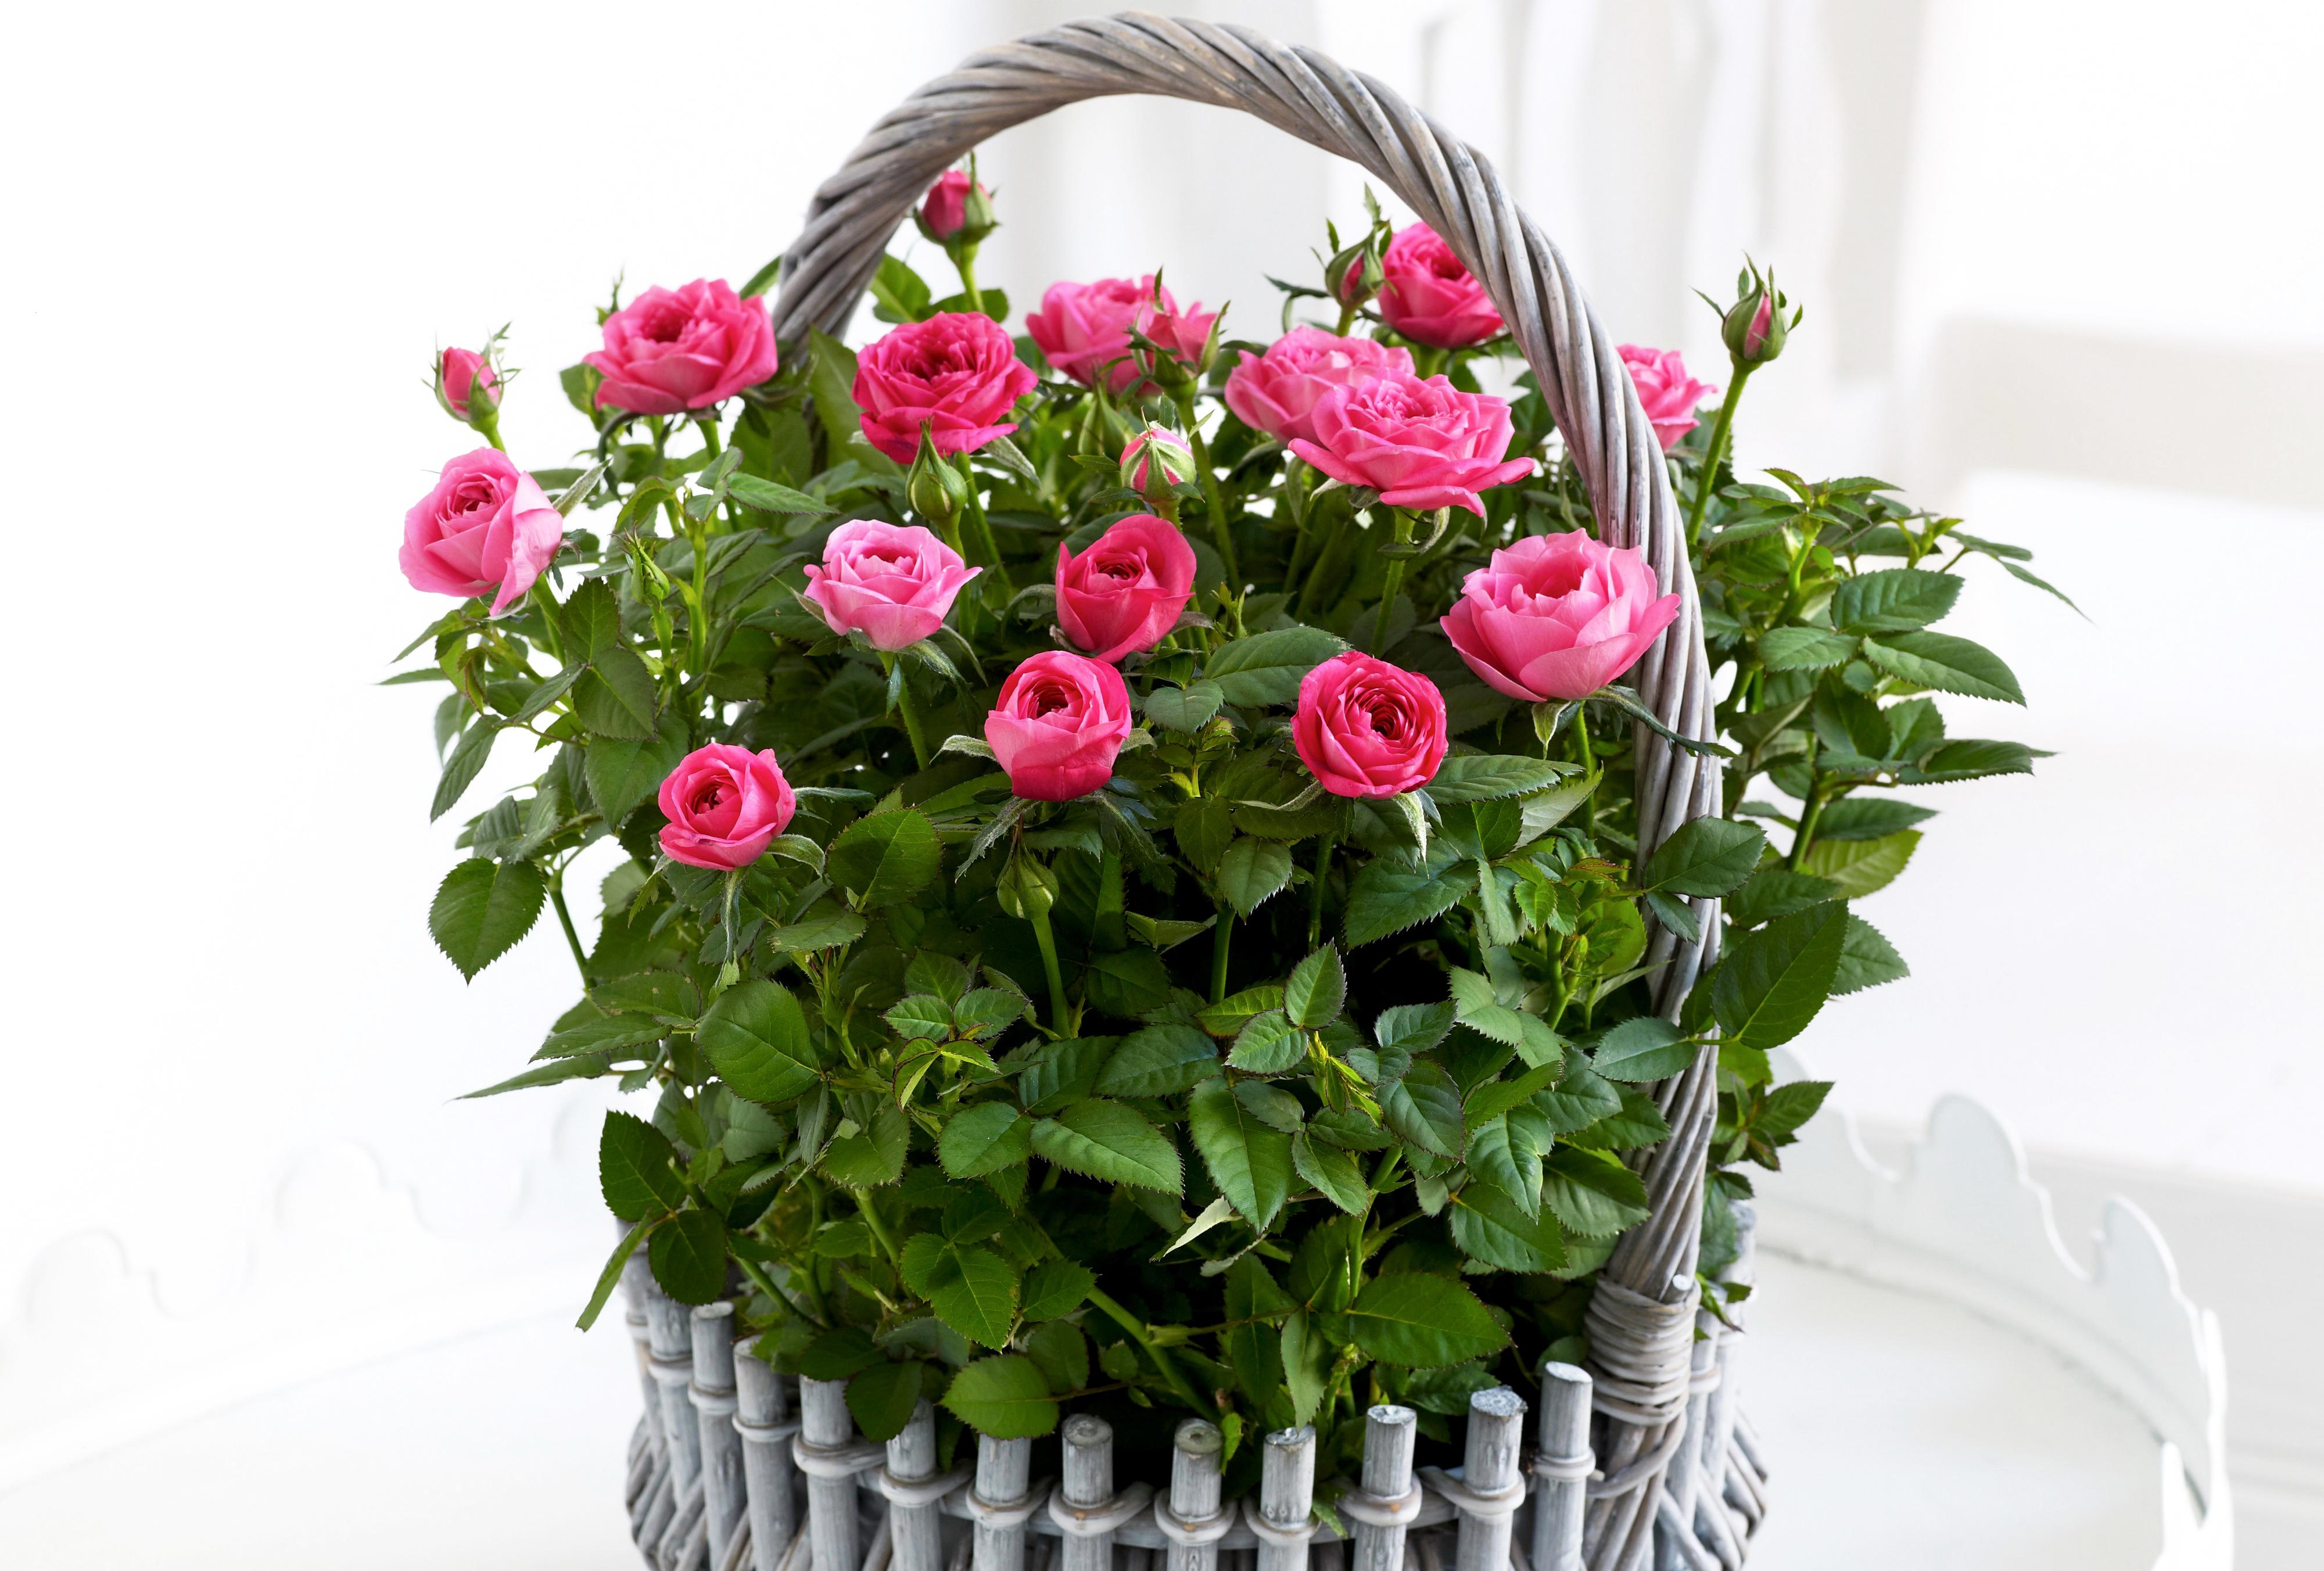 Фото цветов розы в корзине